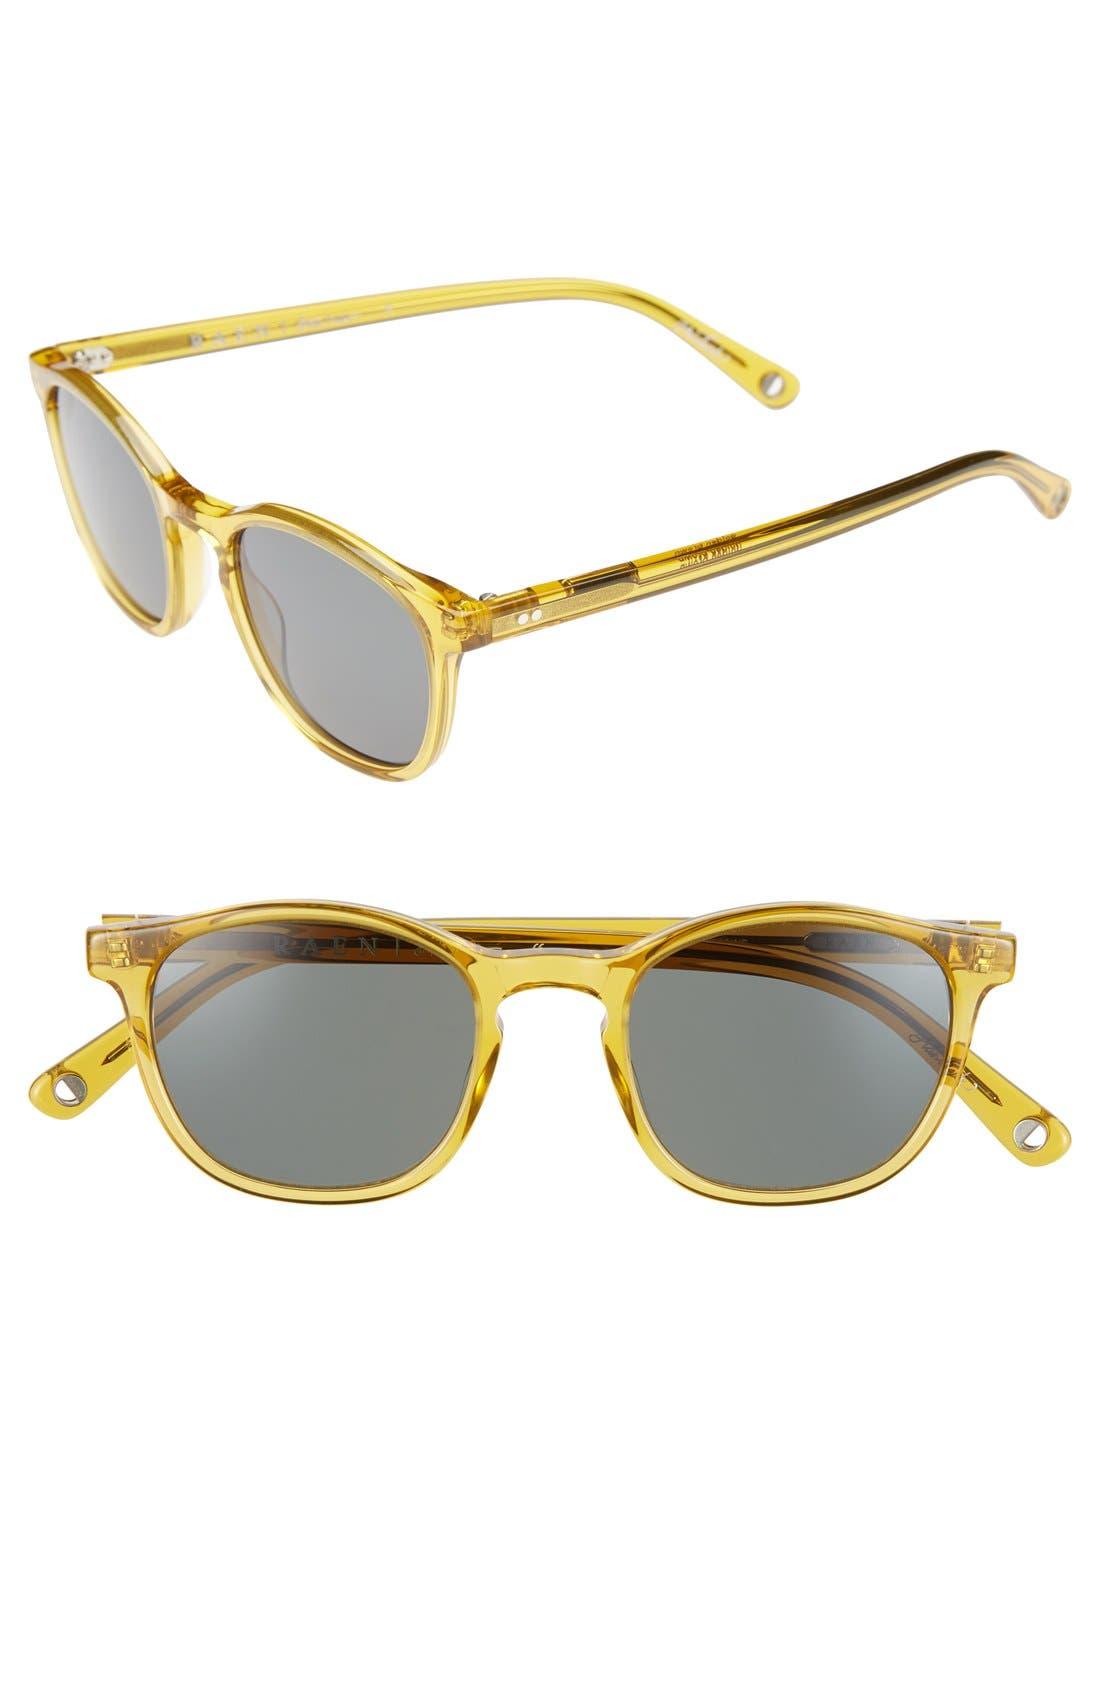 Alternate Image 1 Selected - RAEN 'St. Malo' 48mm Sunglasses